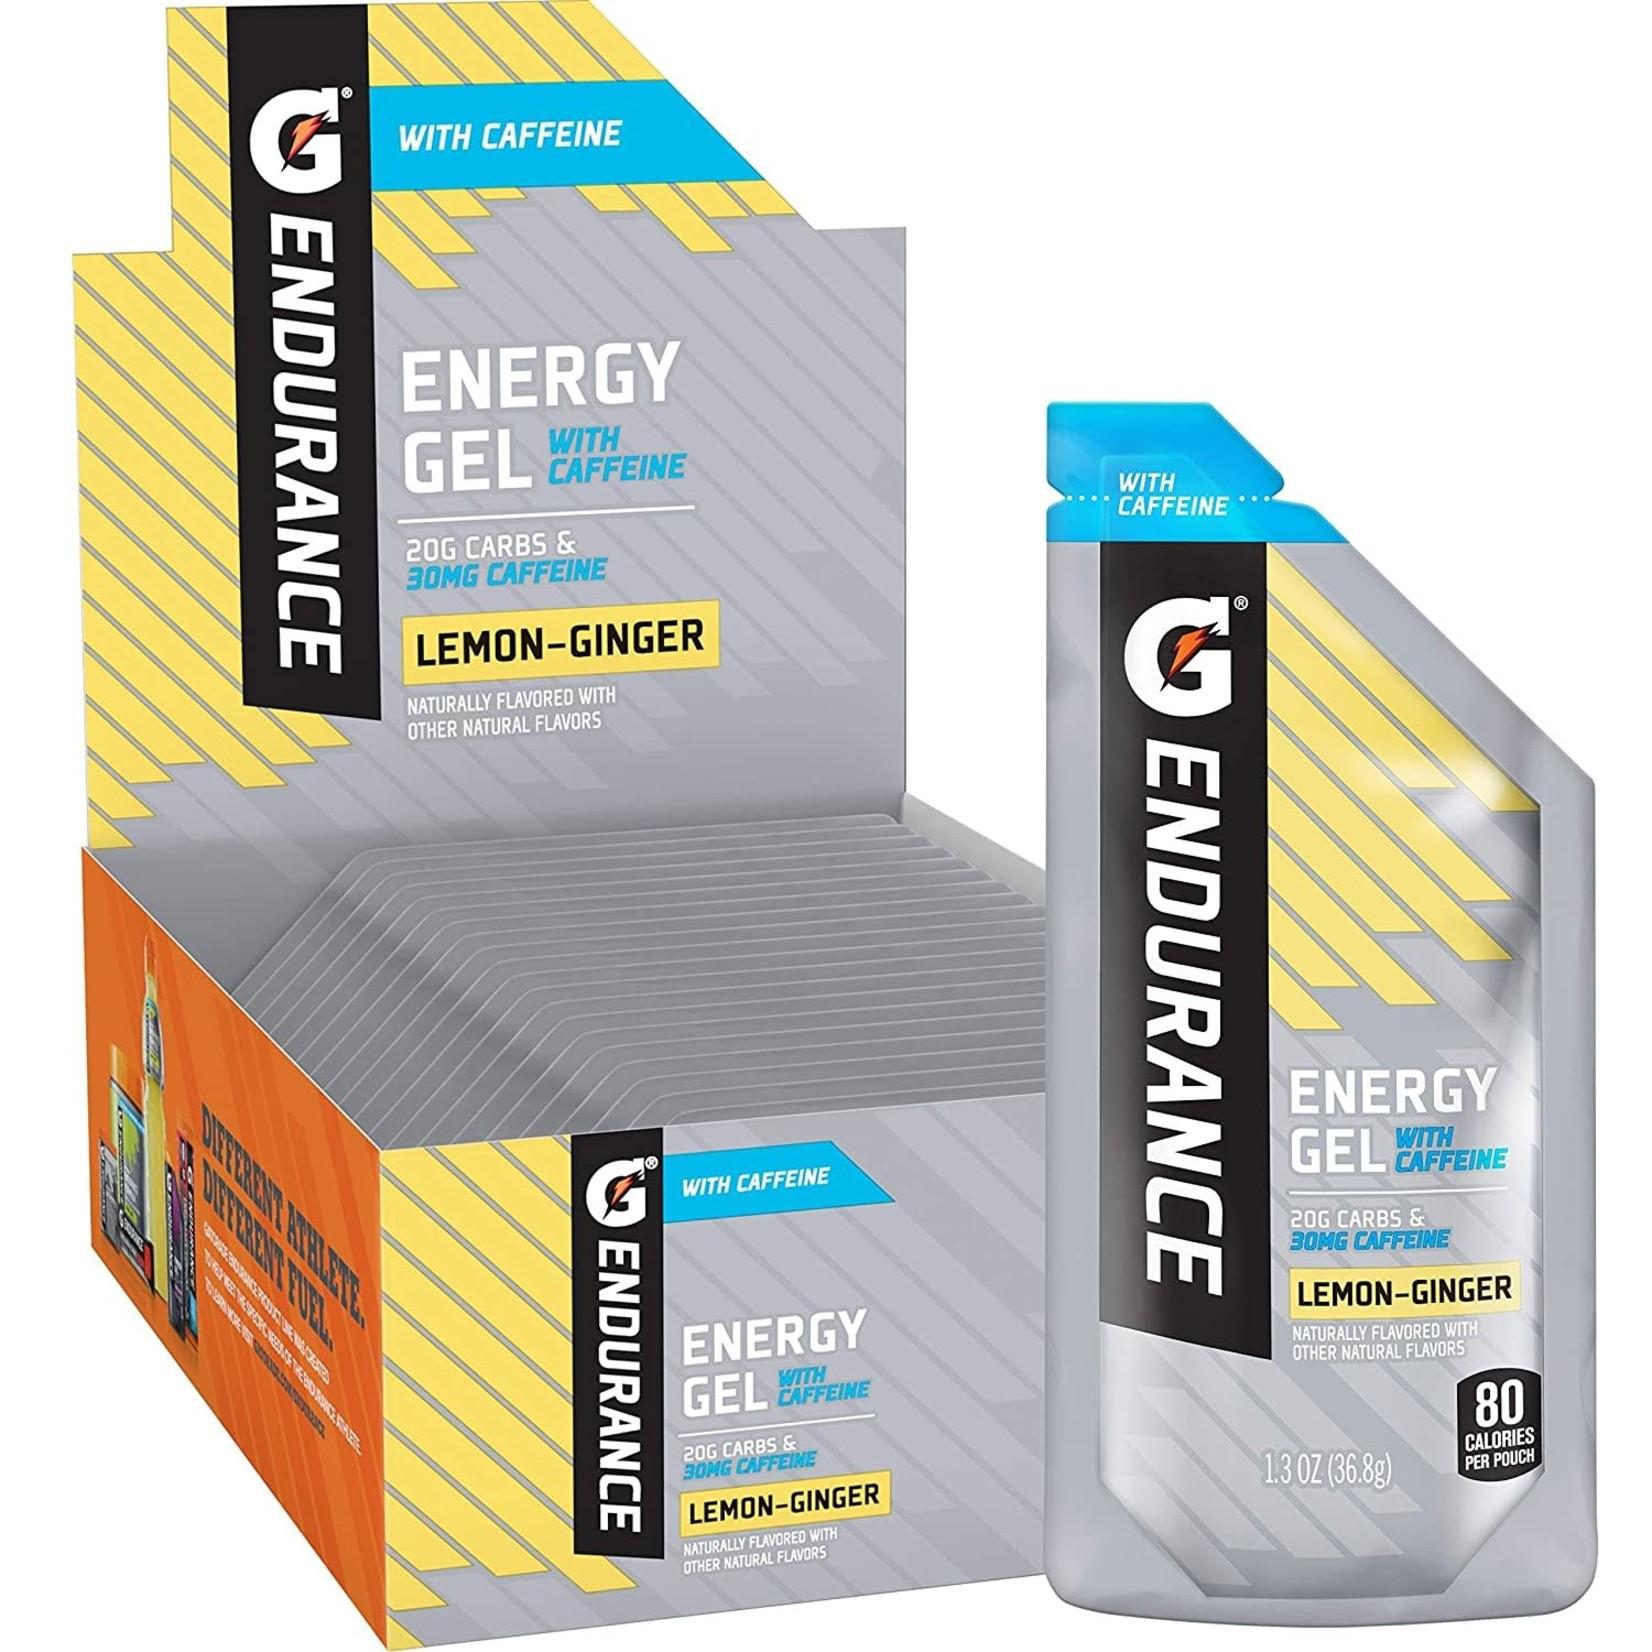 gatorade Gatorade Endurance Energy Gel Lemon-Ginger with CAFFEINE